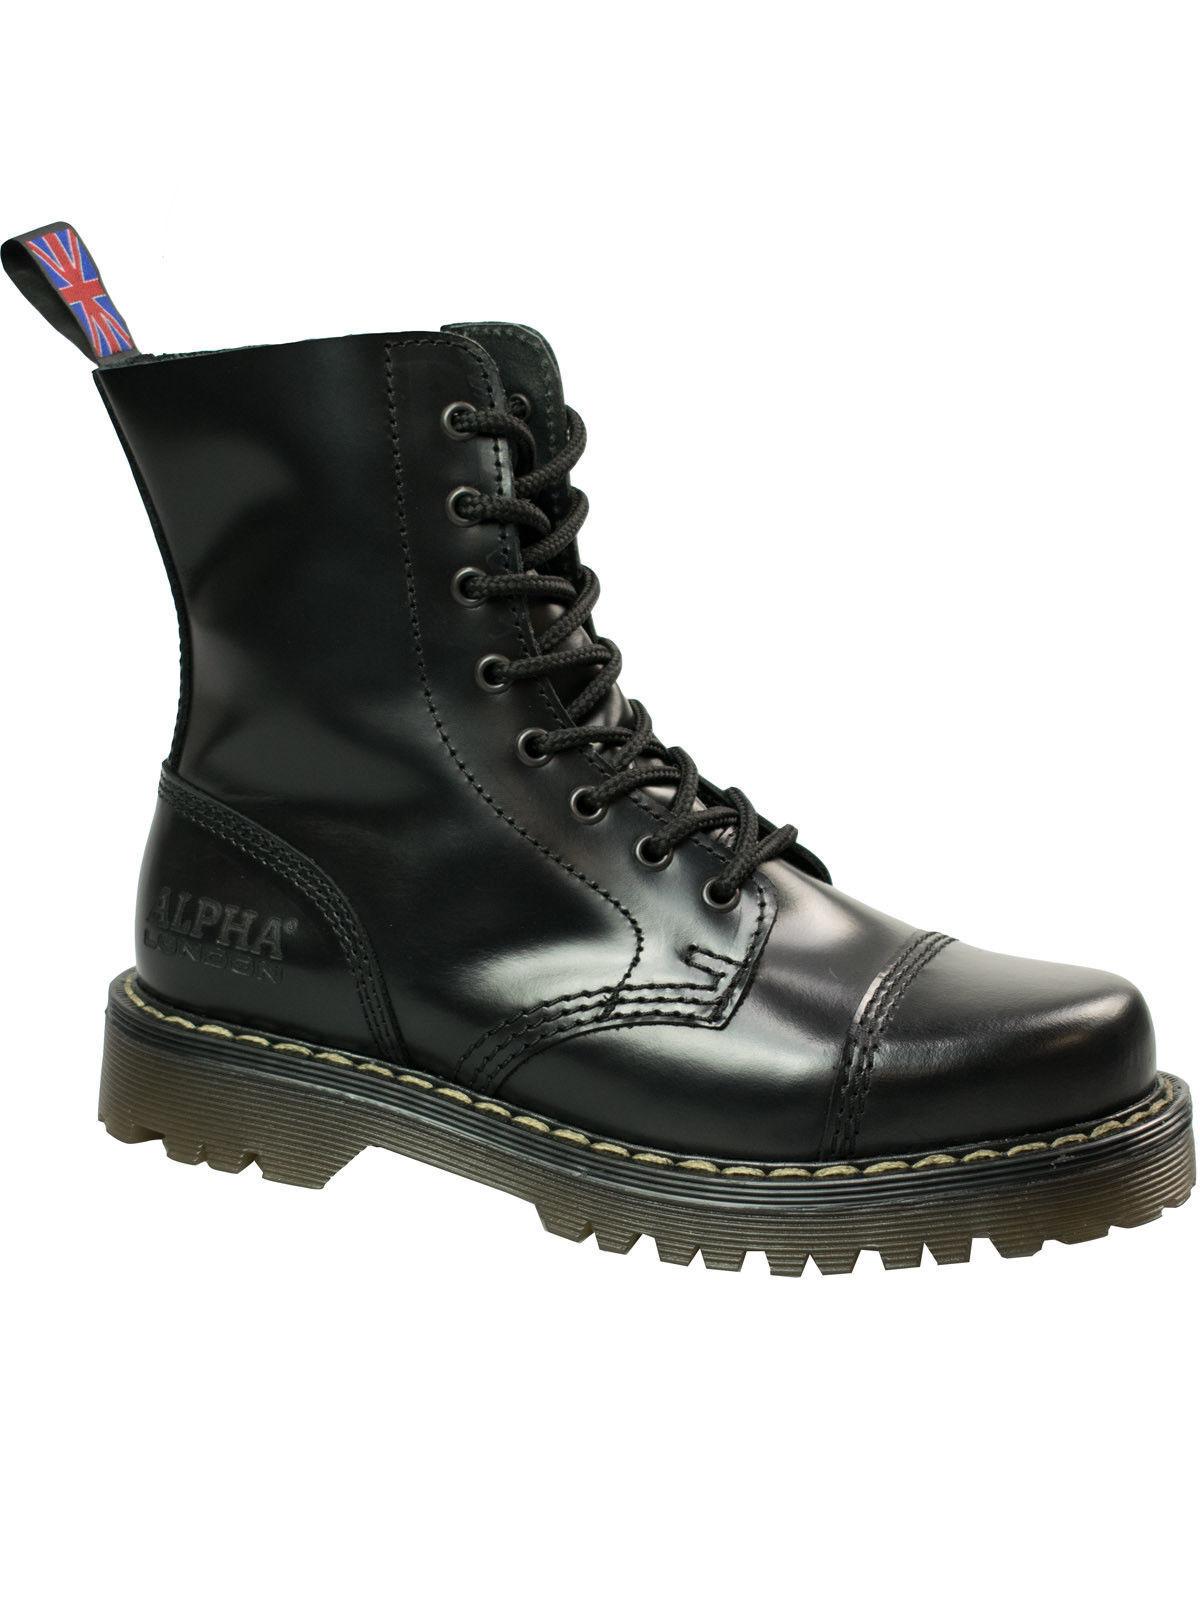 Alpha London 8-loch Boot 4160 Ohne Stahlkappe Beige Beige Stahlkappe Sohle / Beige Naht #5053 f00430